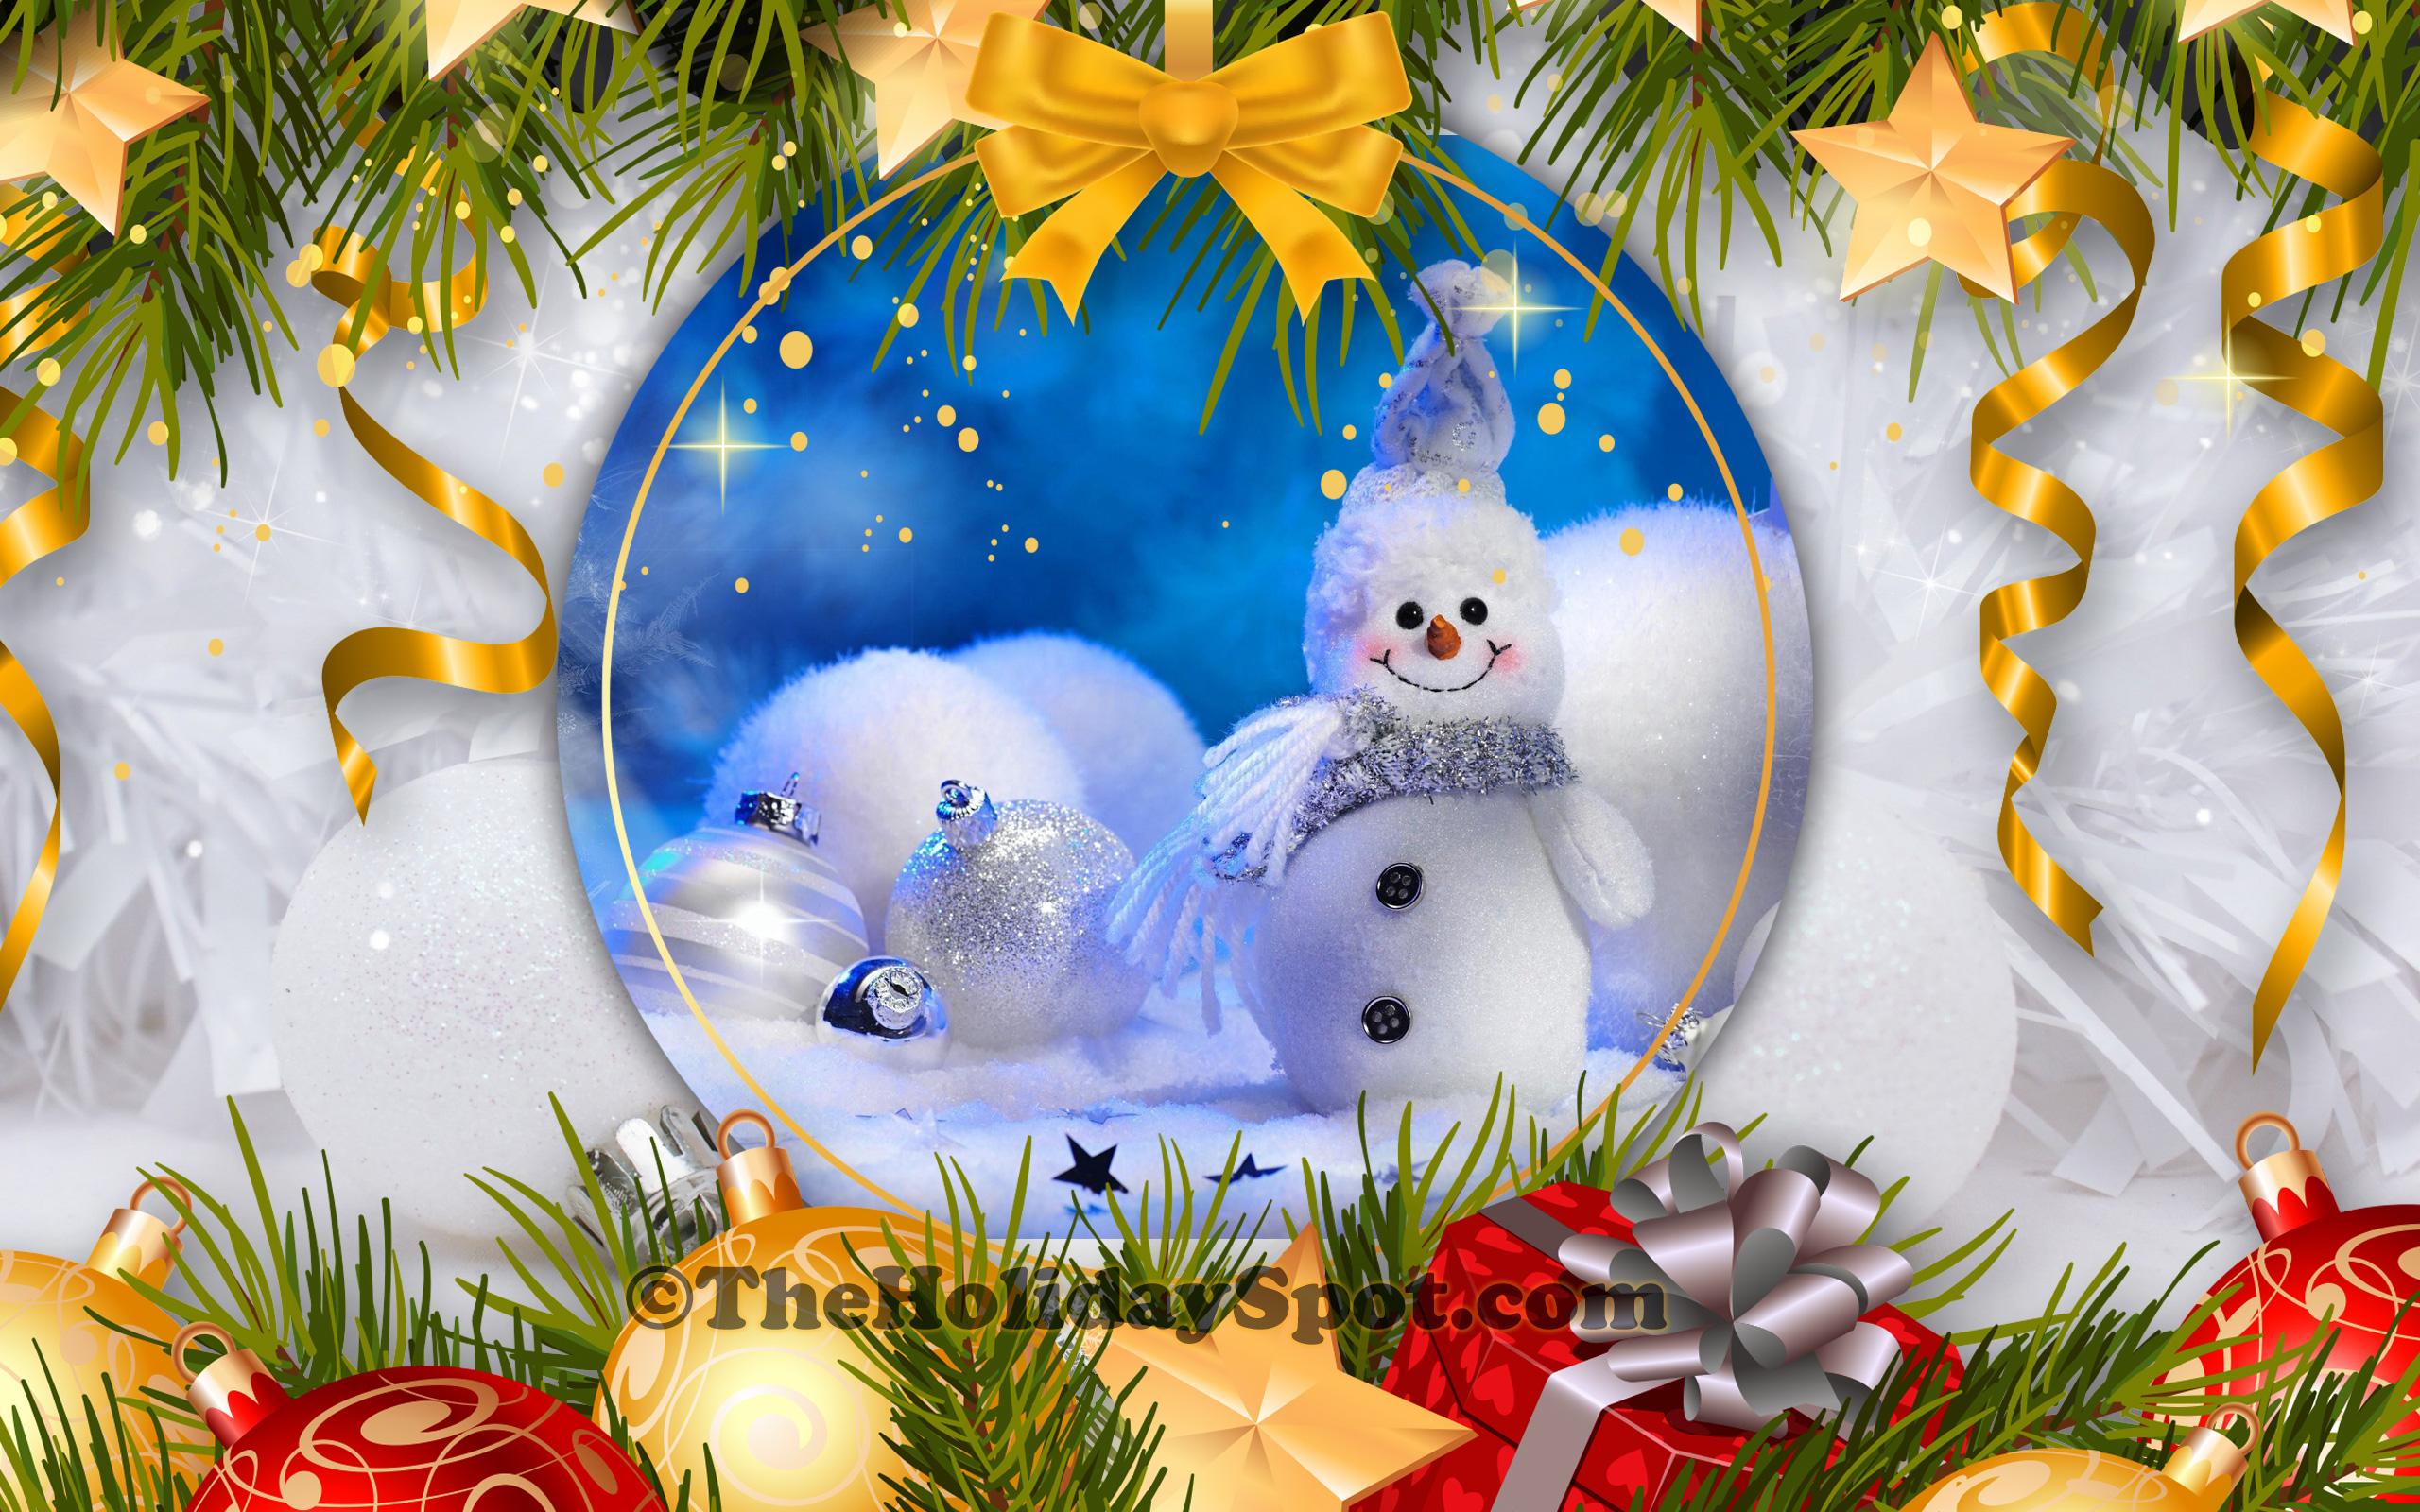 Merry Christmas In Heaven Friend 2560x1600 Download Hd Wallpaper Wallpapertip